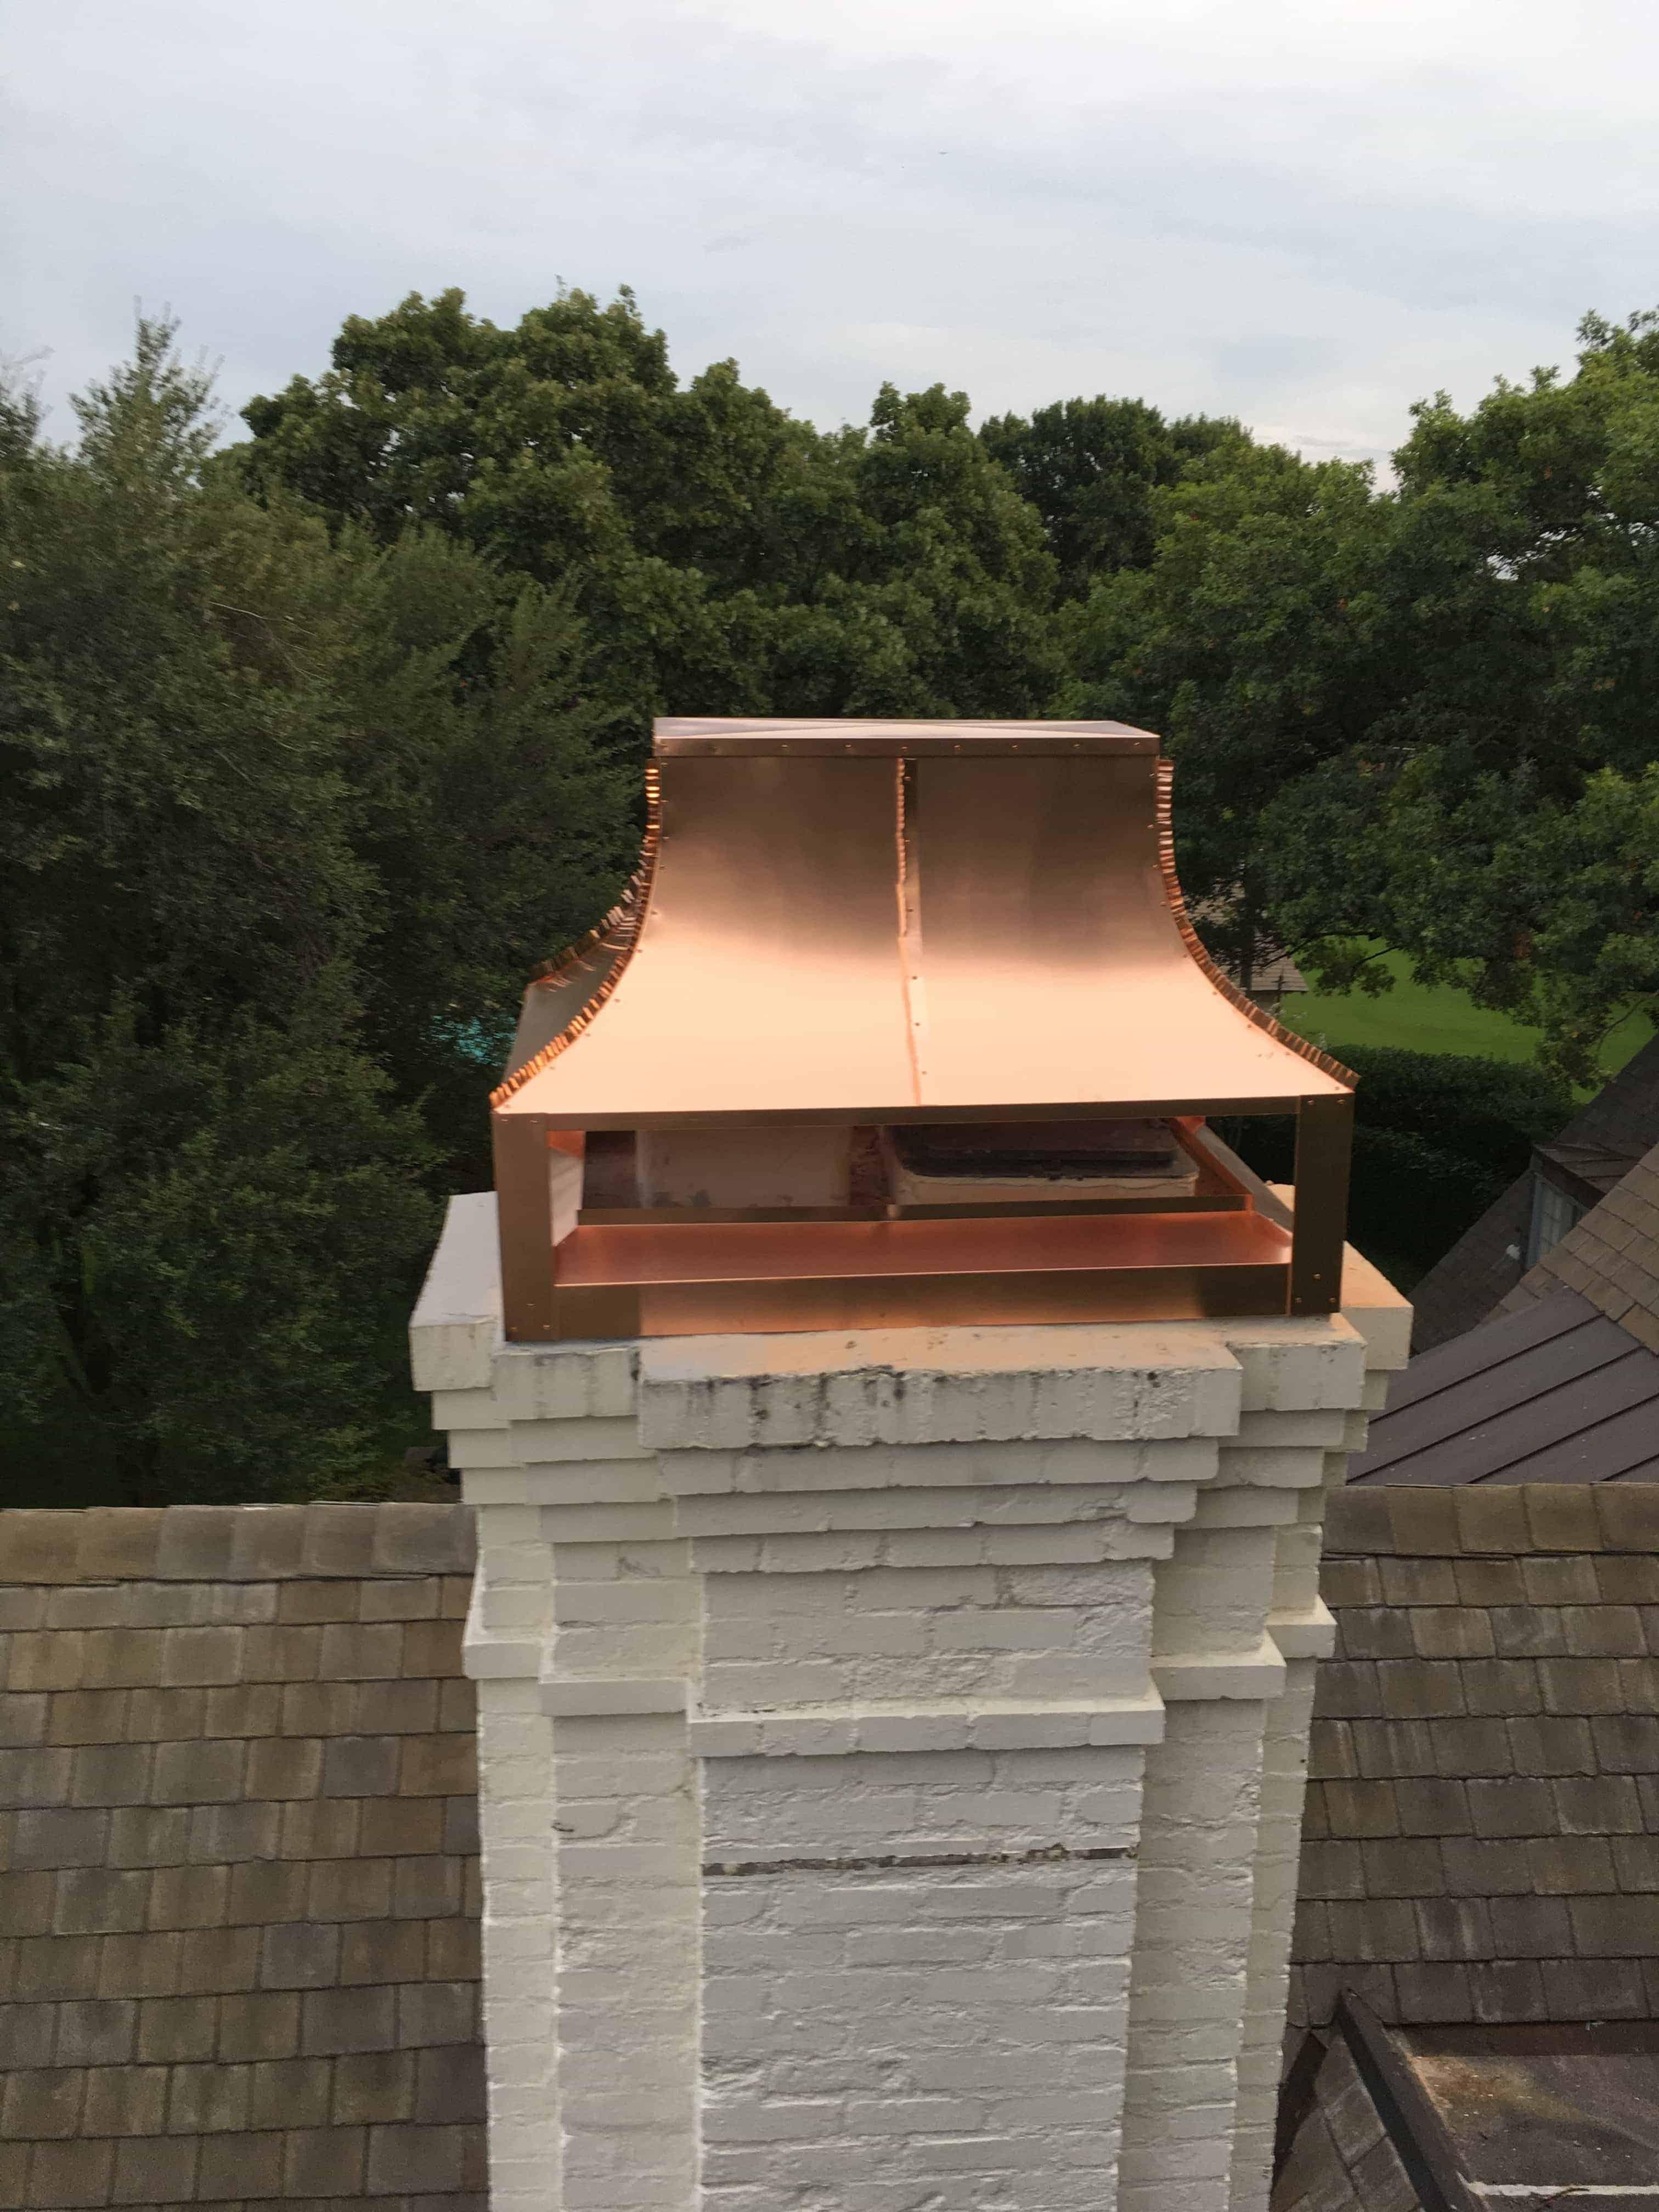 Copper Hayes Chimney Cap Installed on White Brick